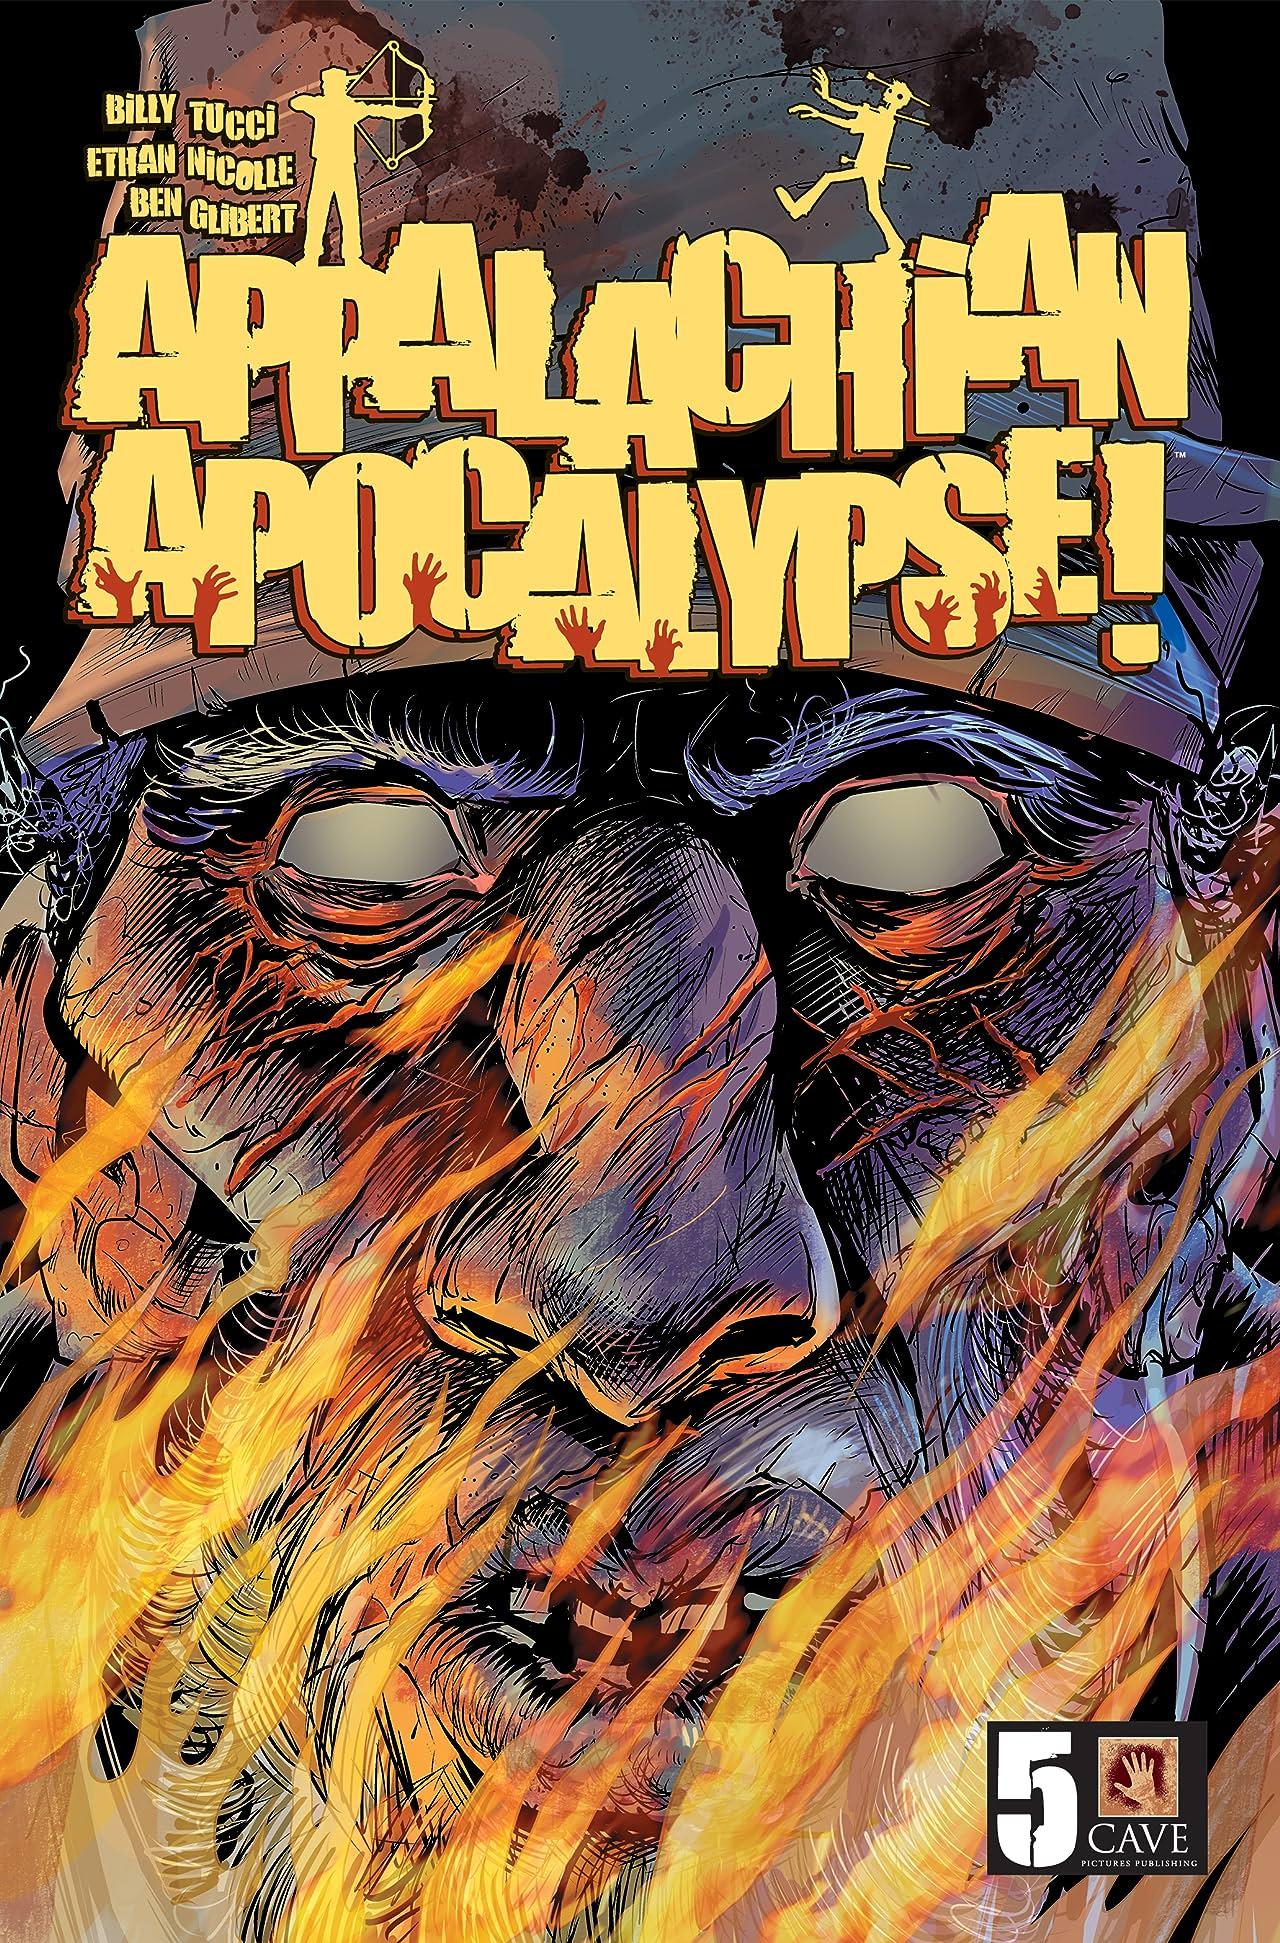 Appalachian Apocalypse! #5